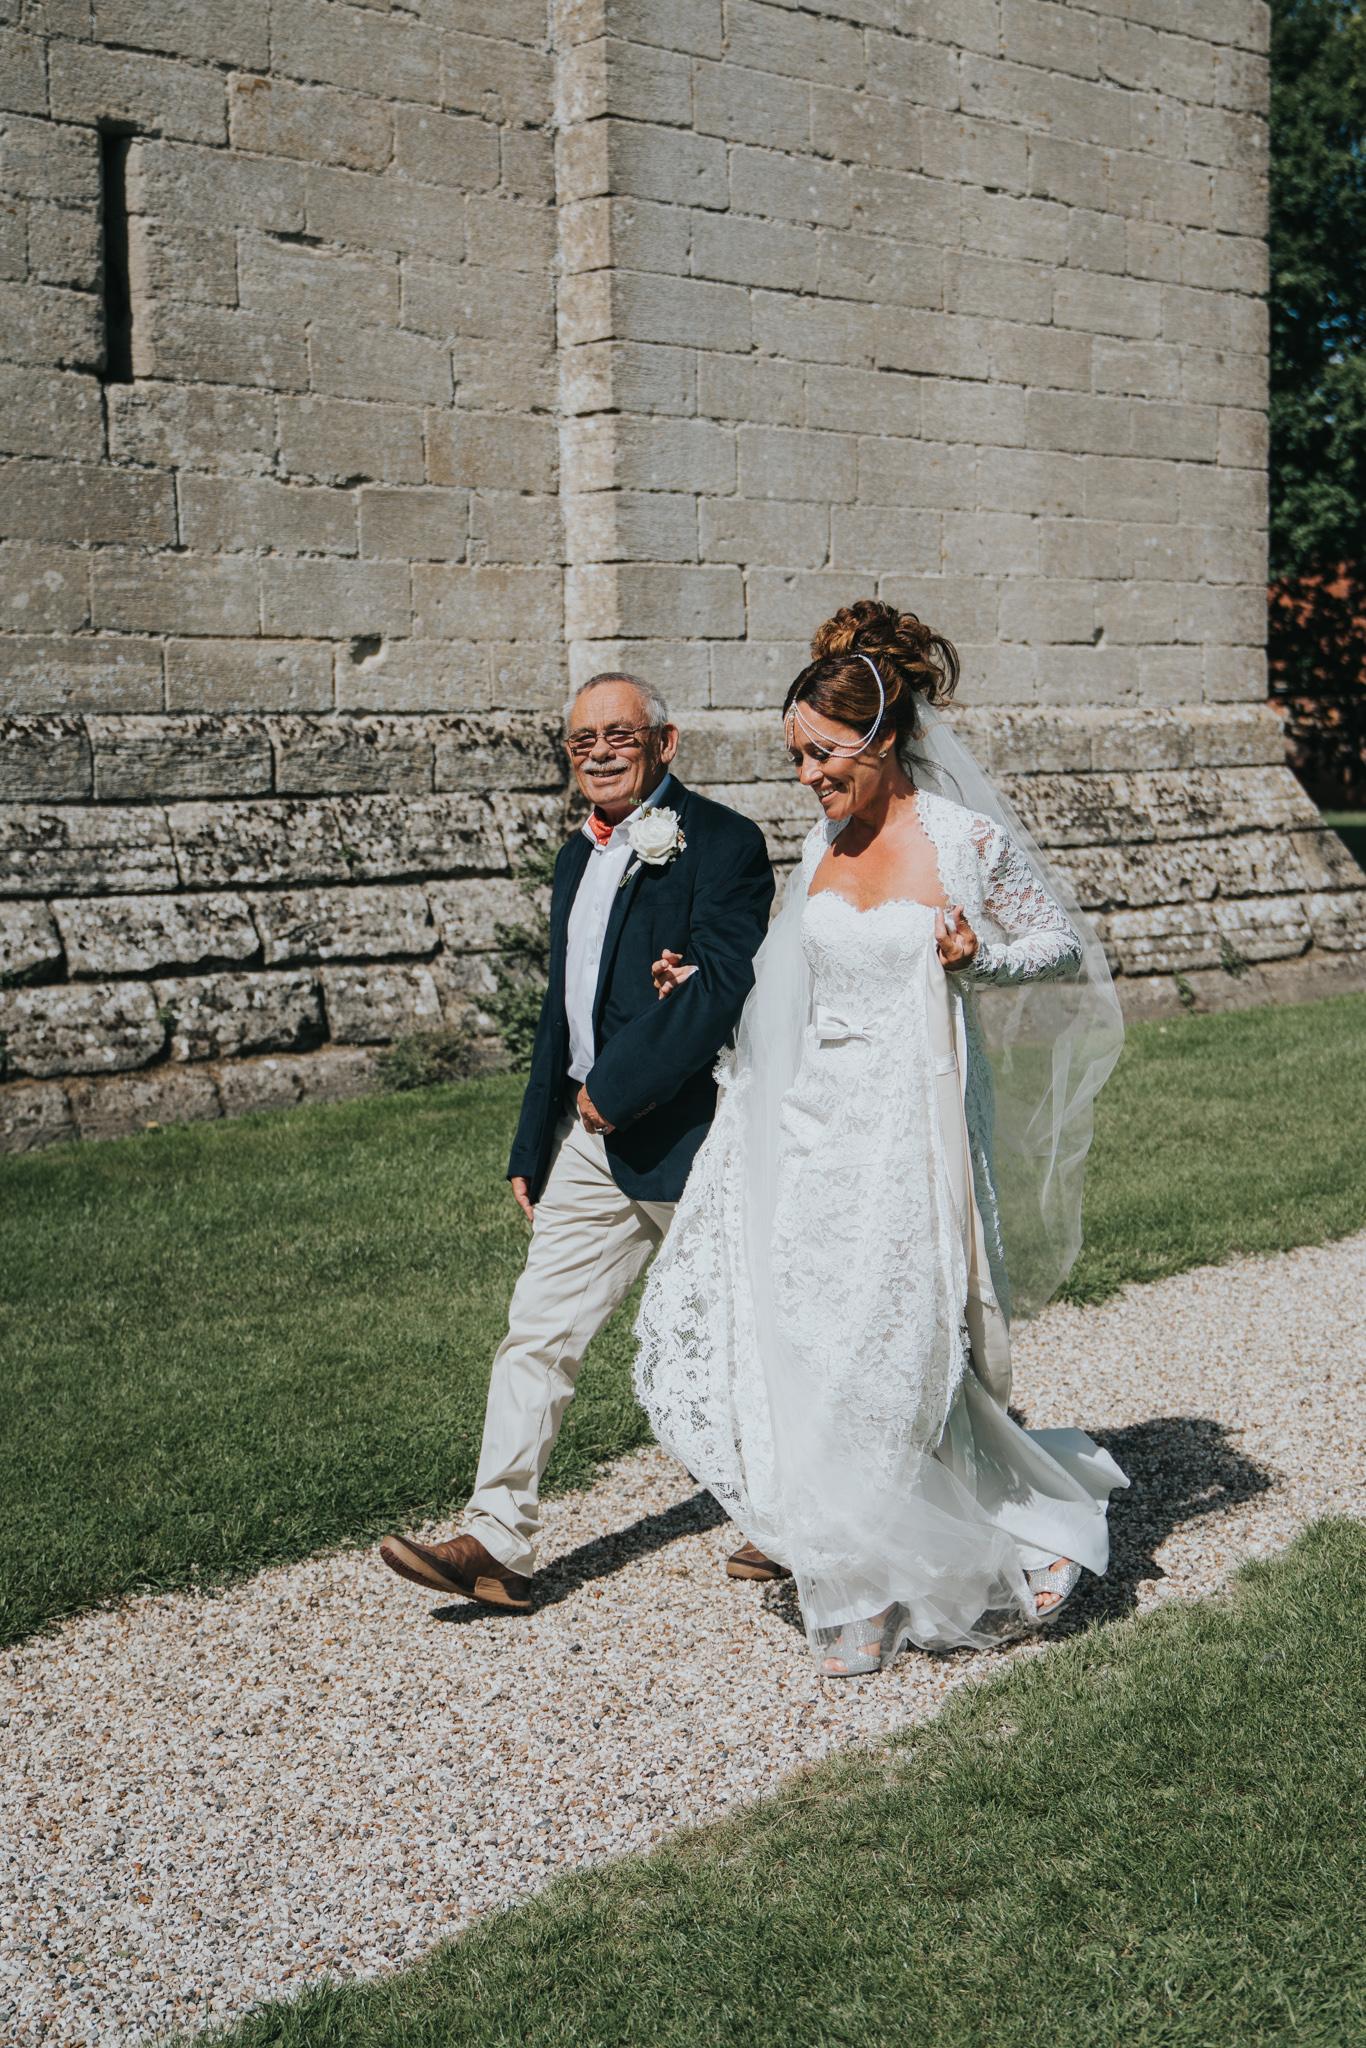 grace-elizabeth-boho-wedding-headingham-castle-essex-wedding-photographer-23.jpg